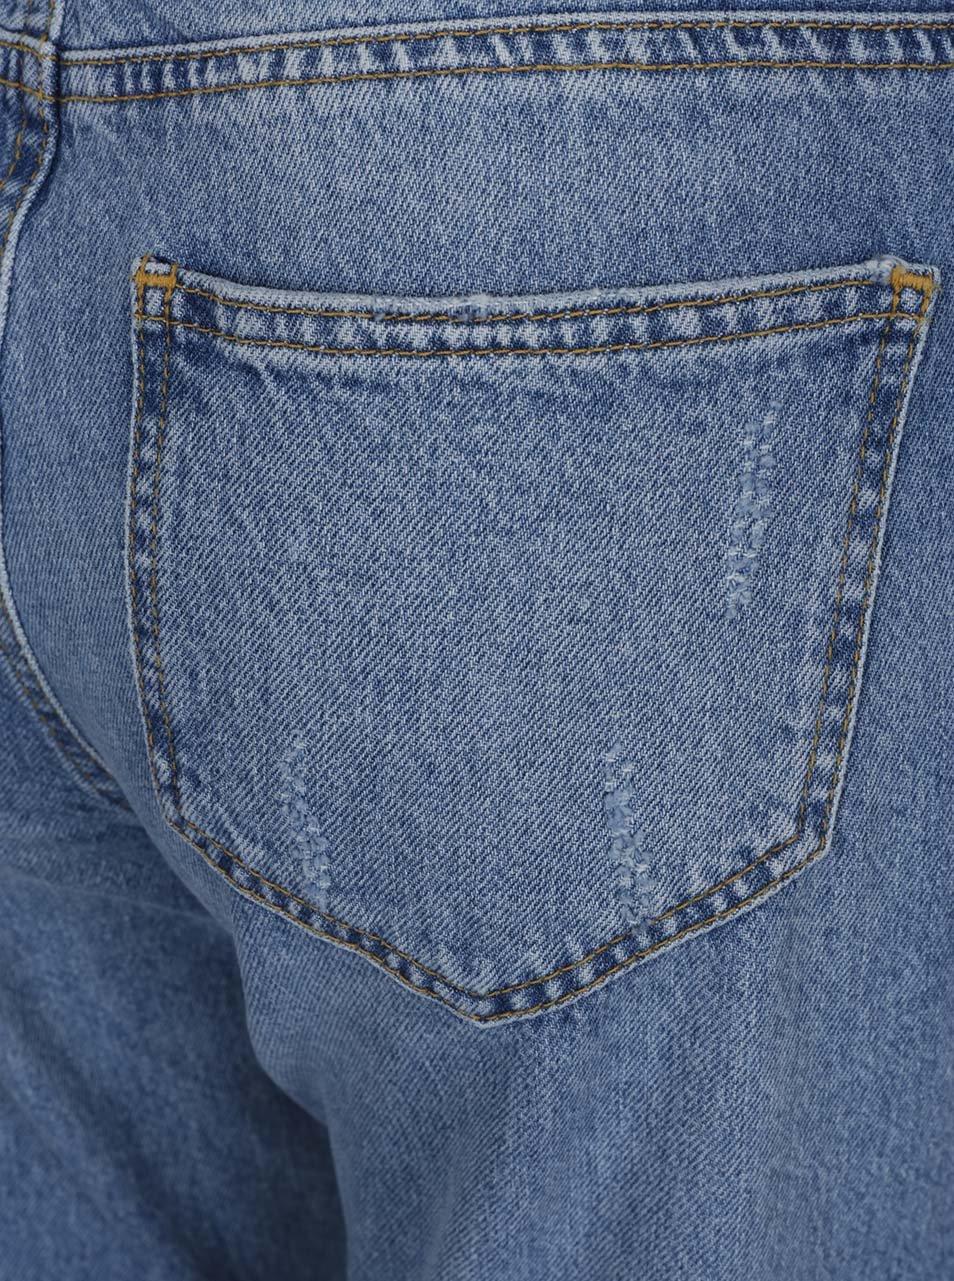 882c3b24722 Modré džínové lacláče s potrhaným efektem Miss Selfridge ...